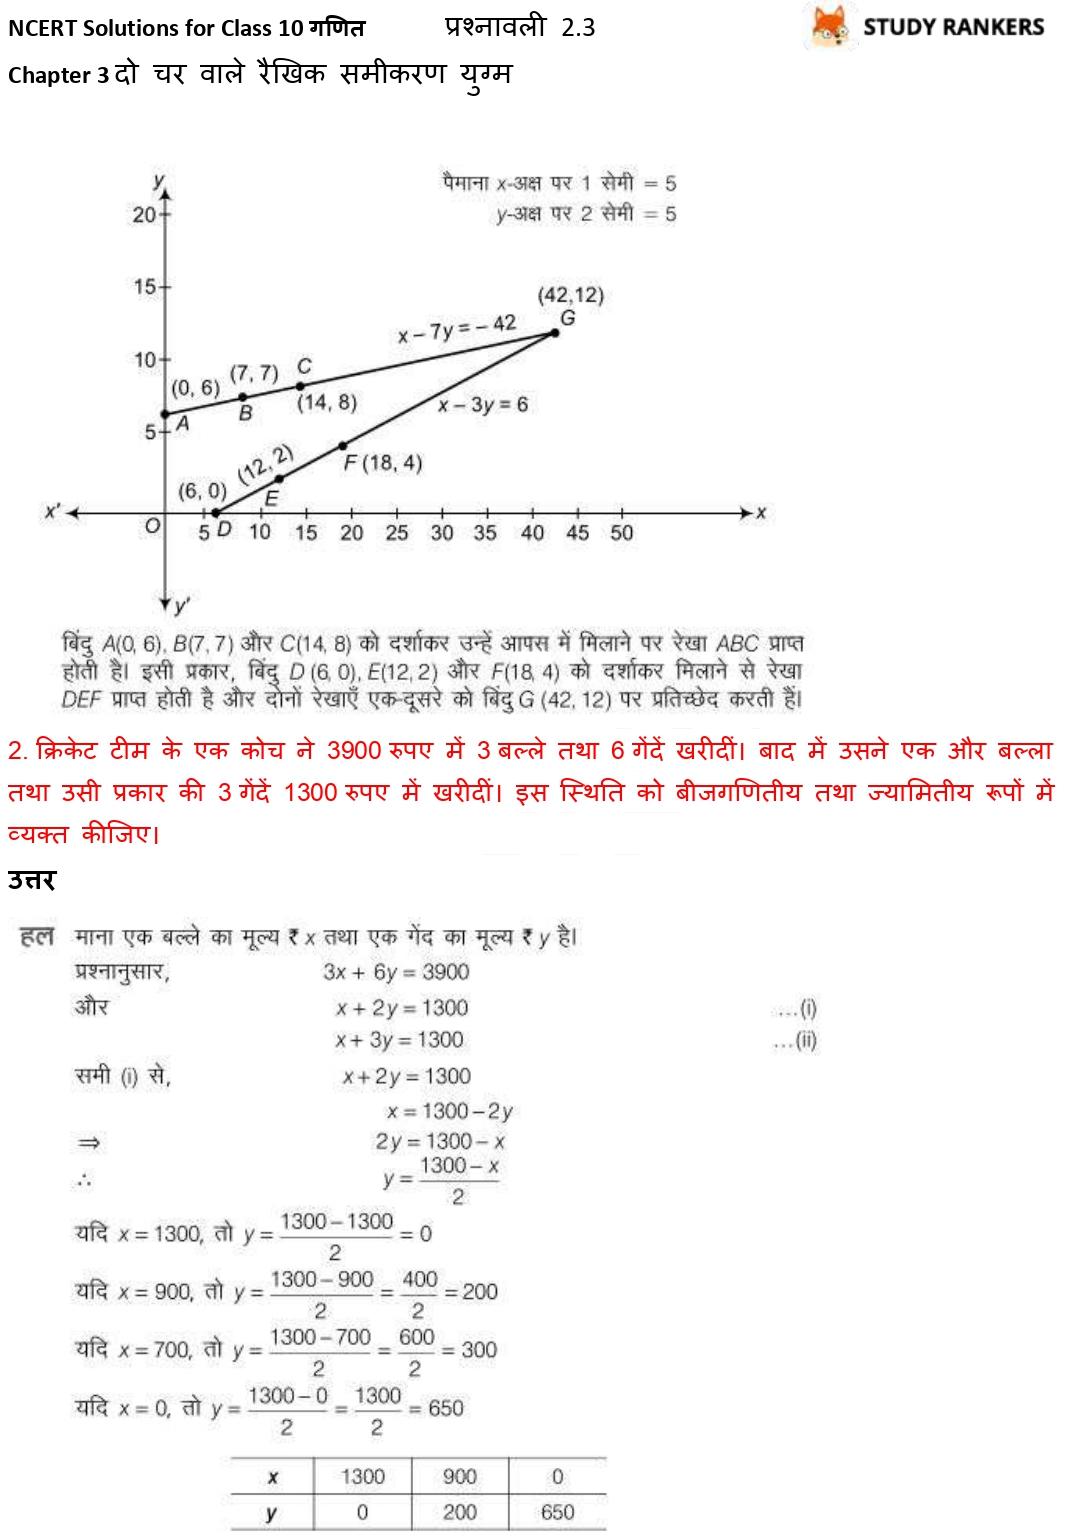 NCERT Solutions for Class 10 Maths Chapter 3 दो चर वाले रैखिक समीकरण युग्म प्रश्नावली 3.1 Part 2